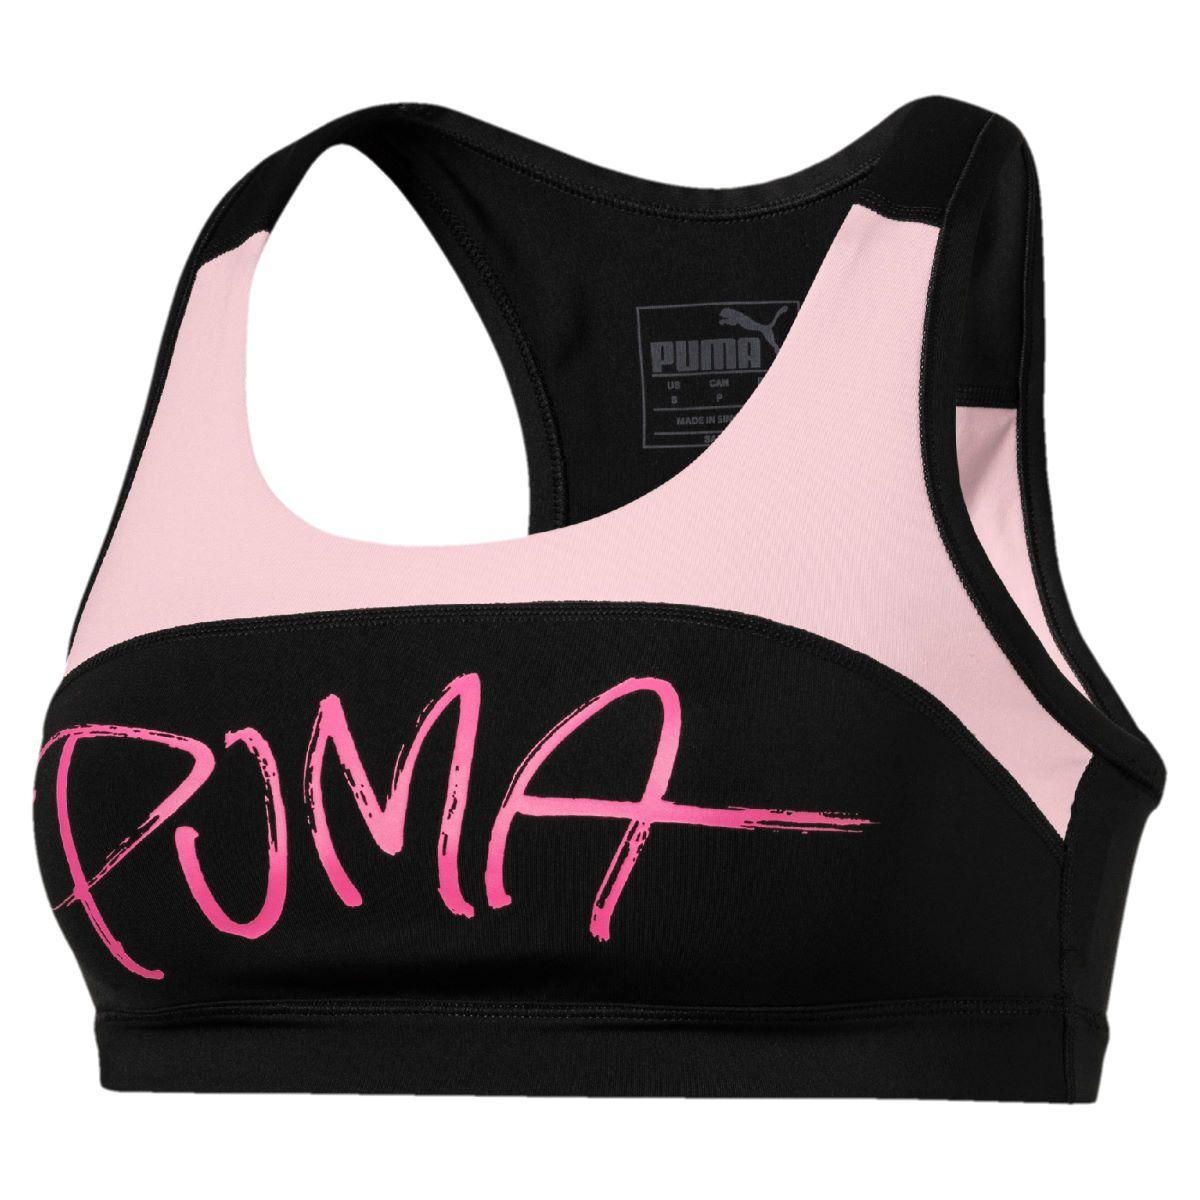 Puma 4 Keeps Sweet Bra Sports Bras Running shoes for men